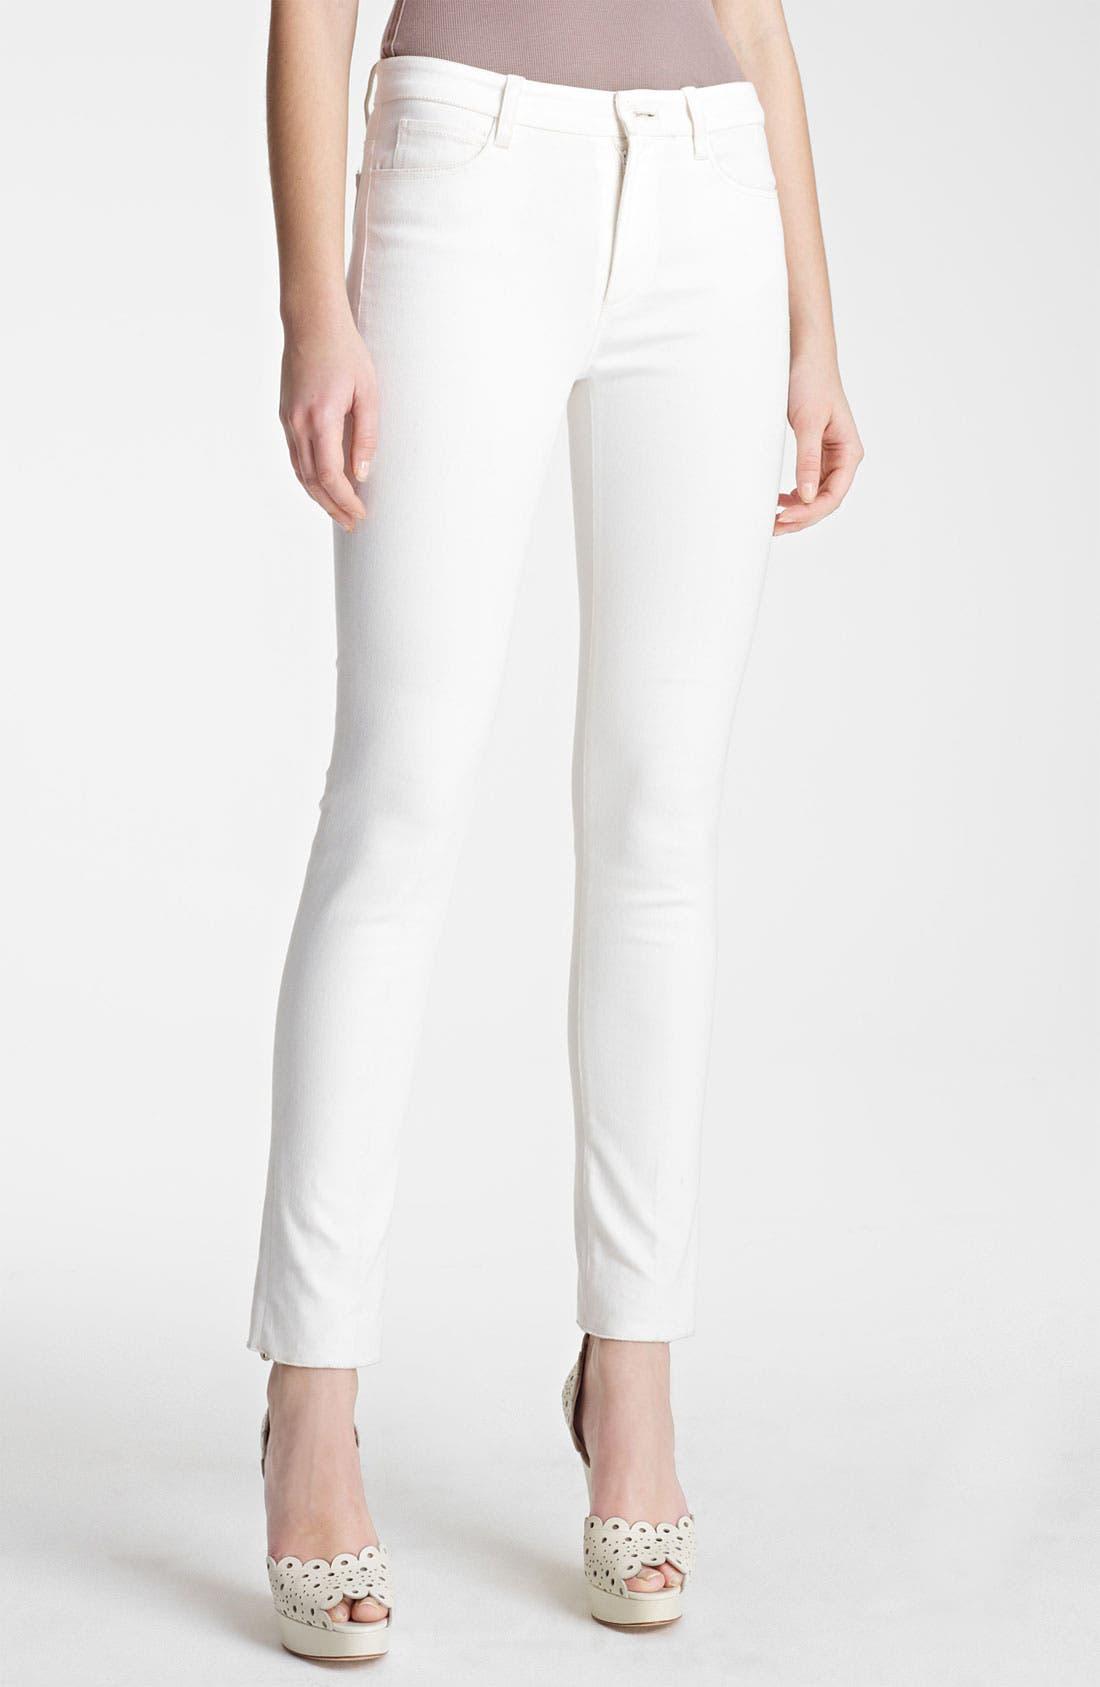 Alternate Image 1 Selected - Oscar de la Renta Skinny Jeans